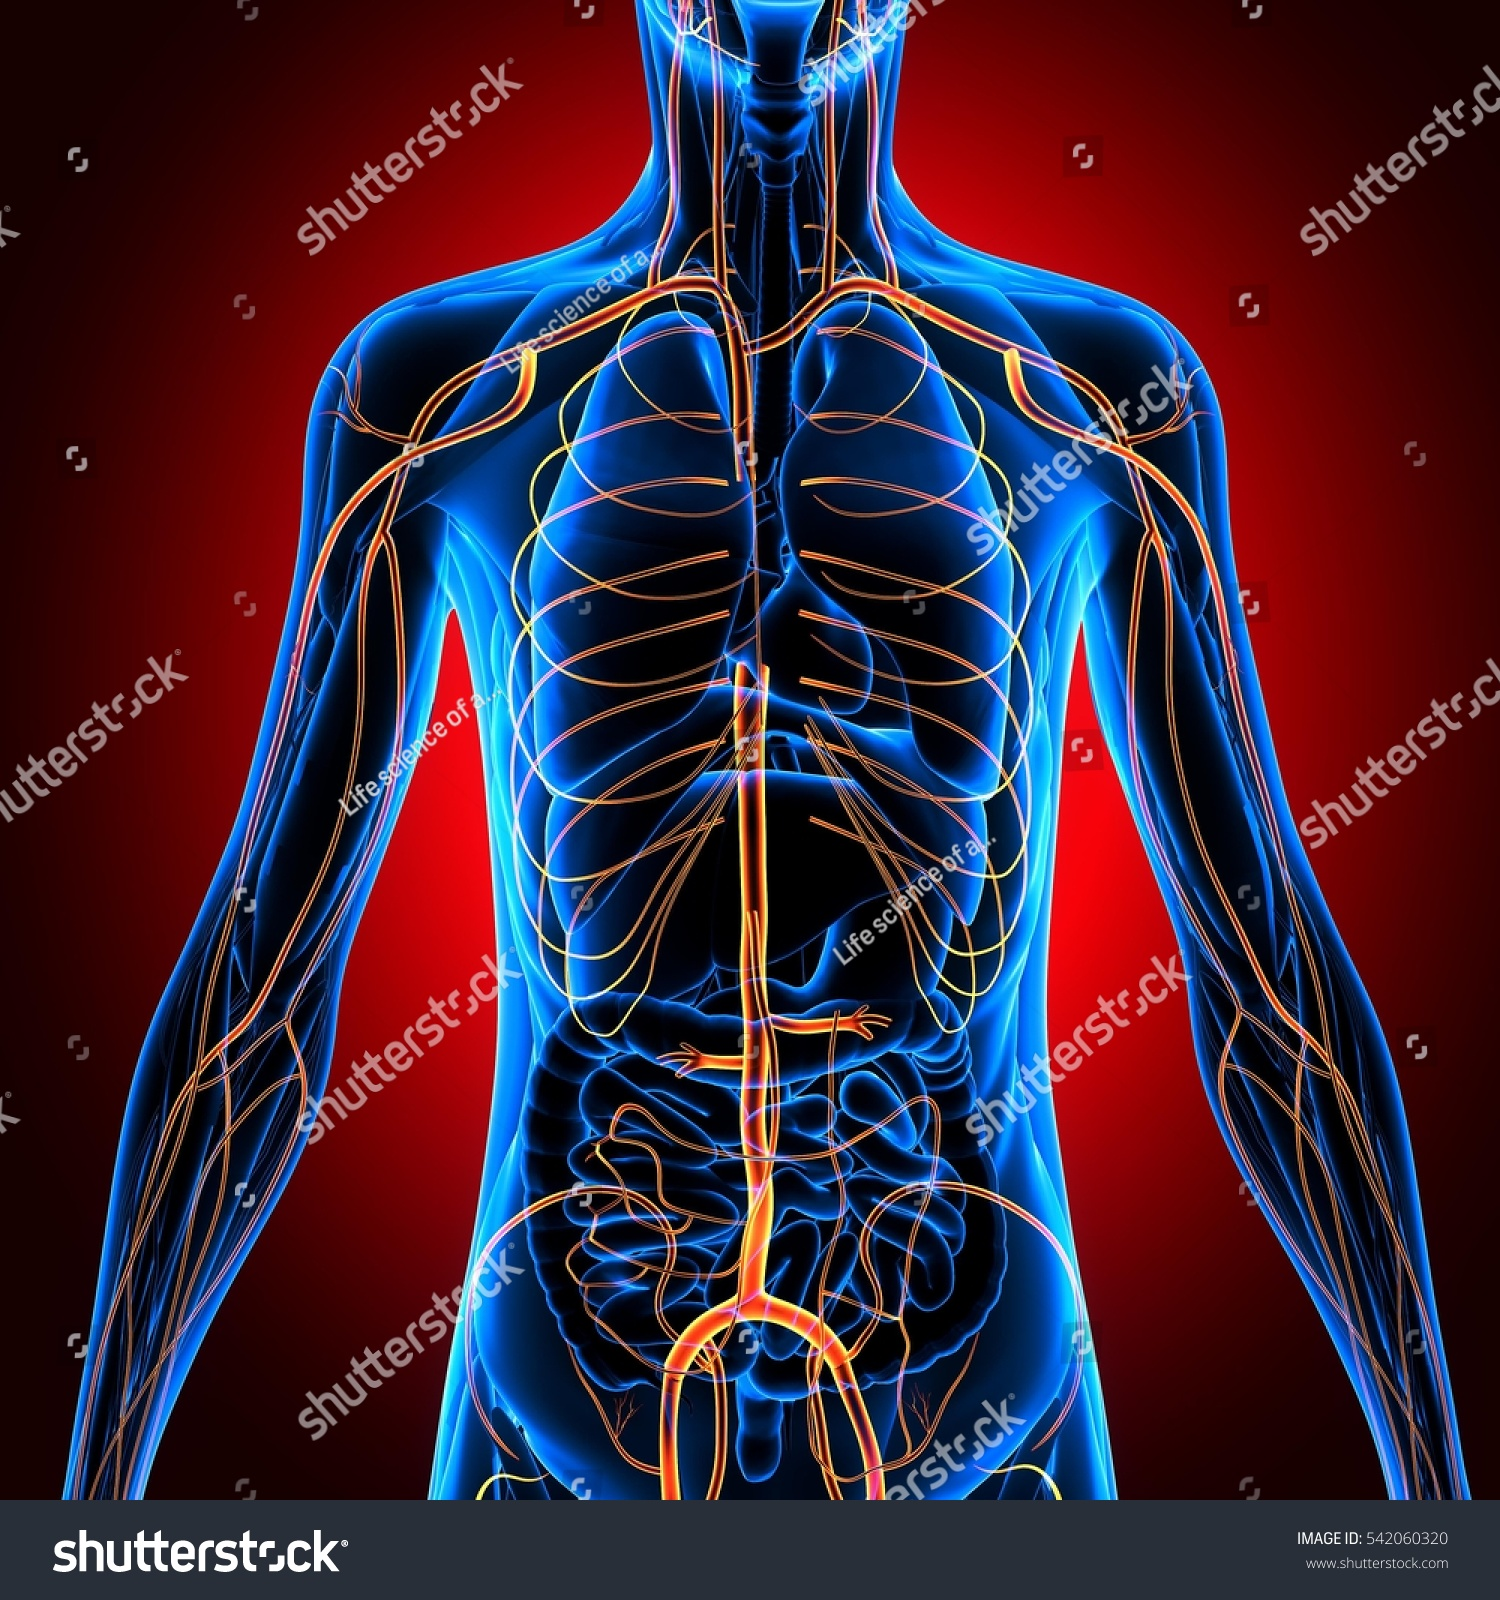 Royalty Free Stock Illustration Of 3 D Illustration Human Body